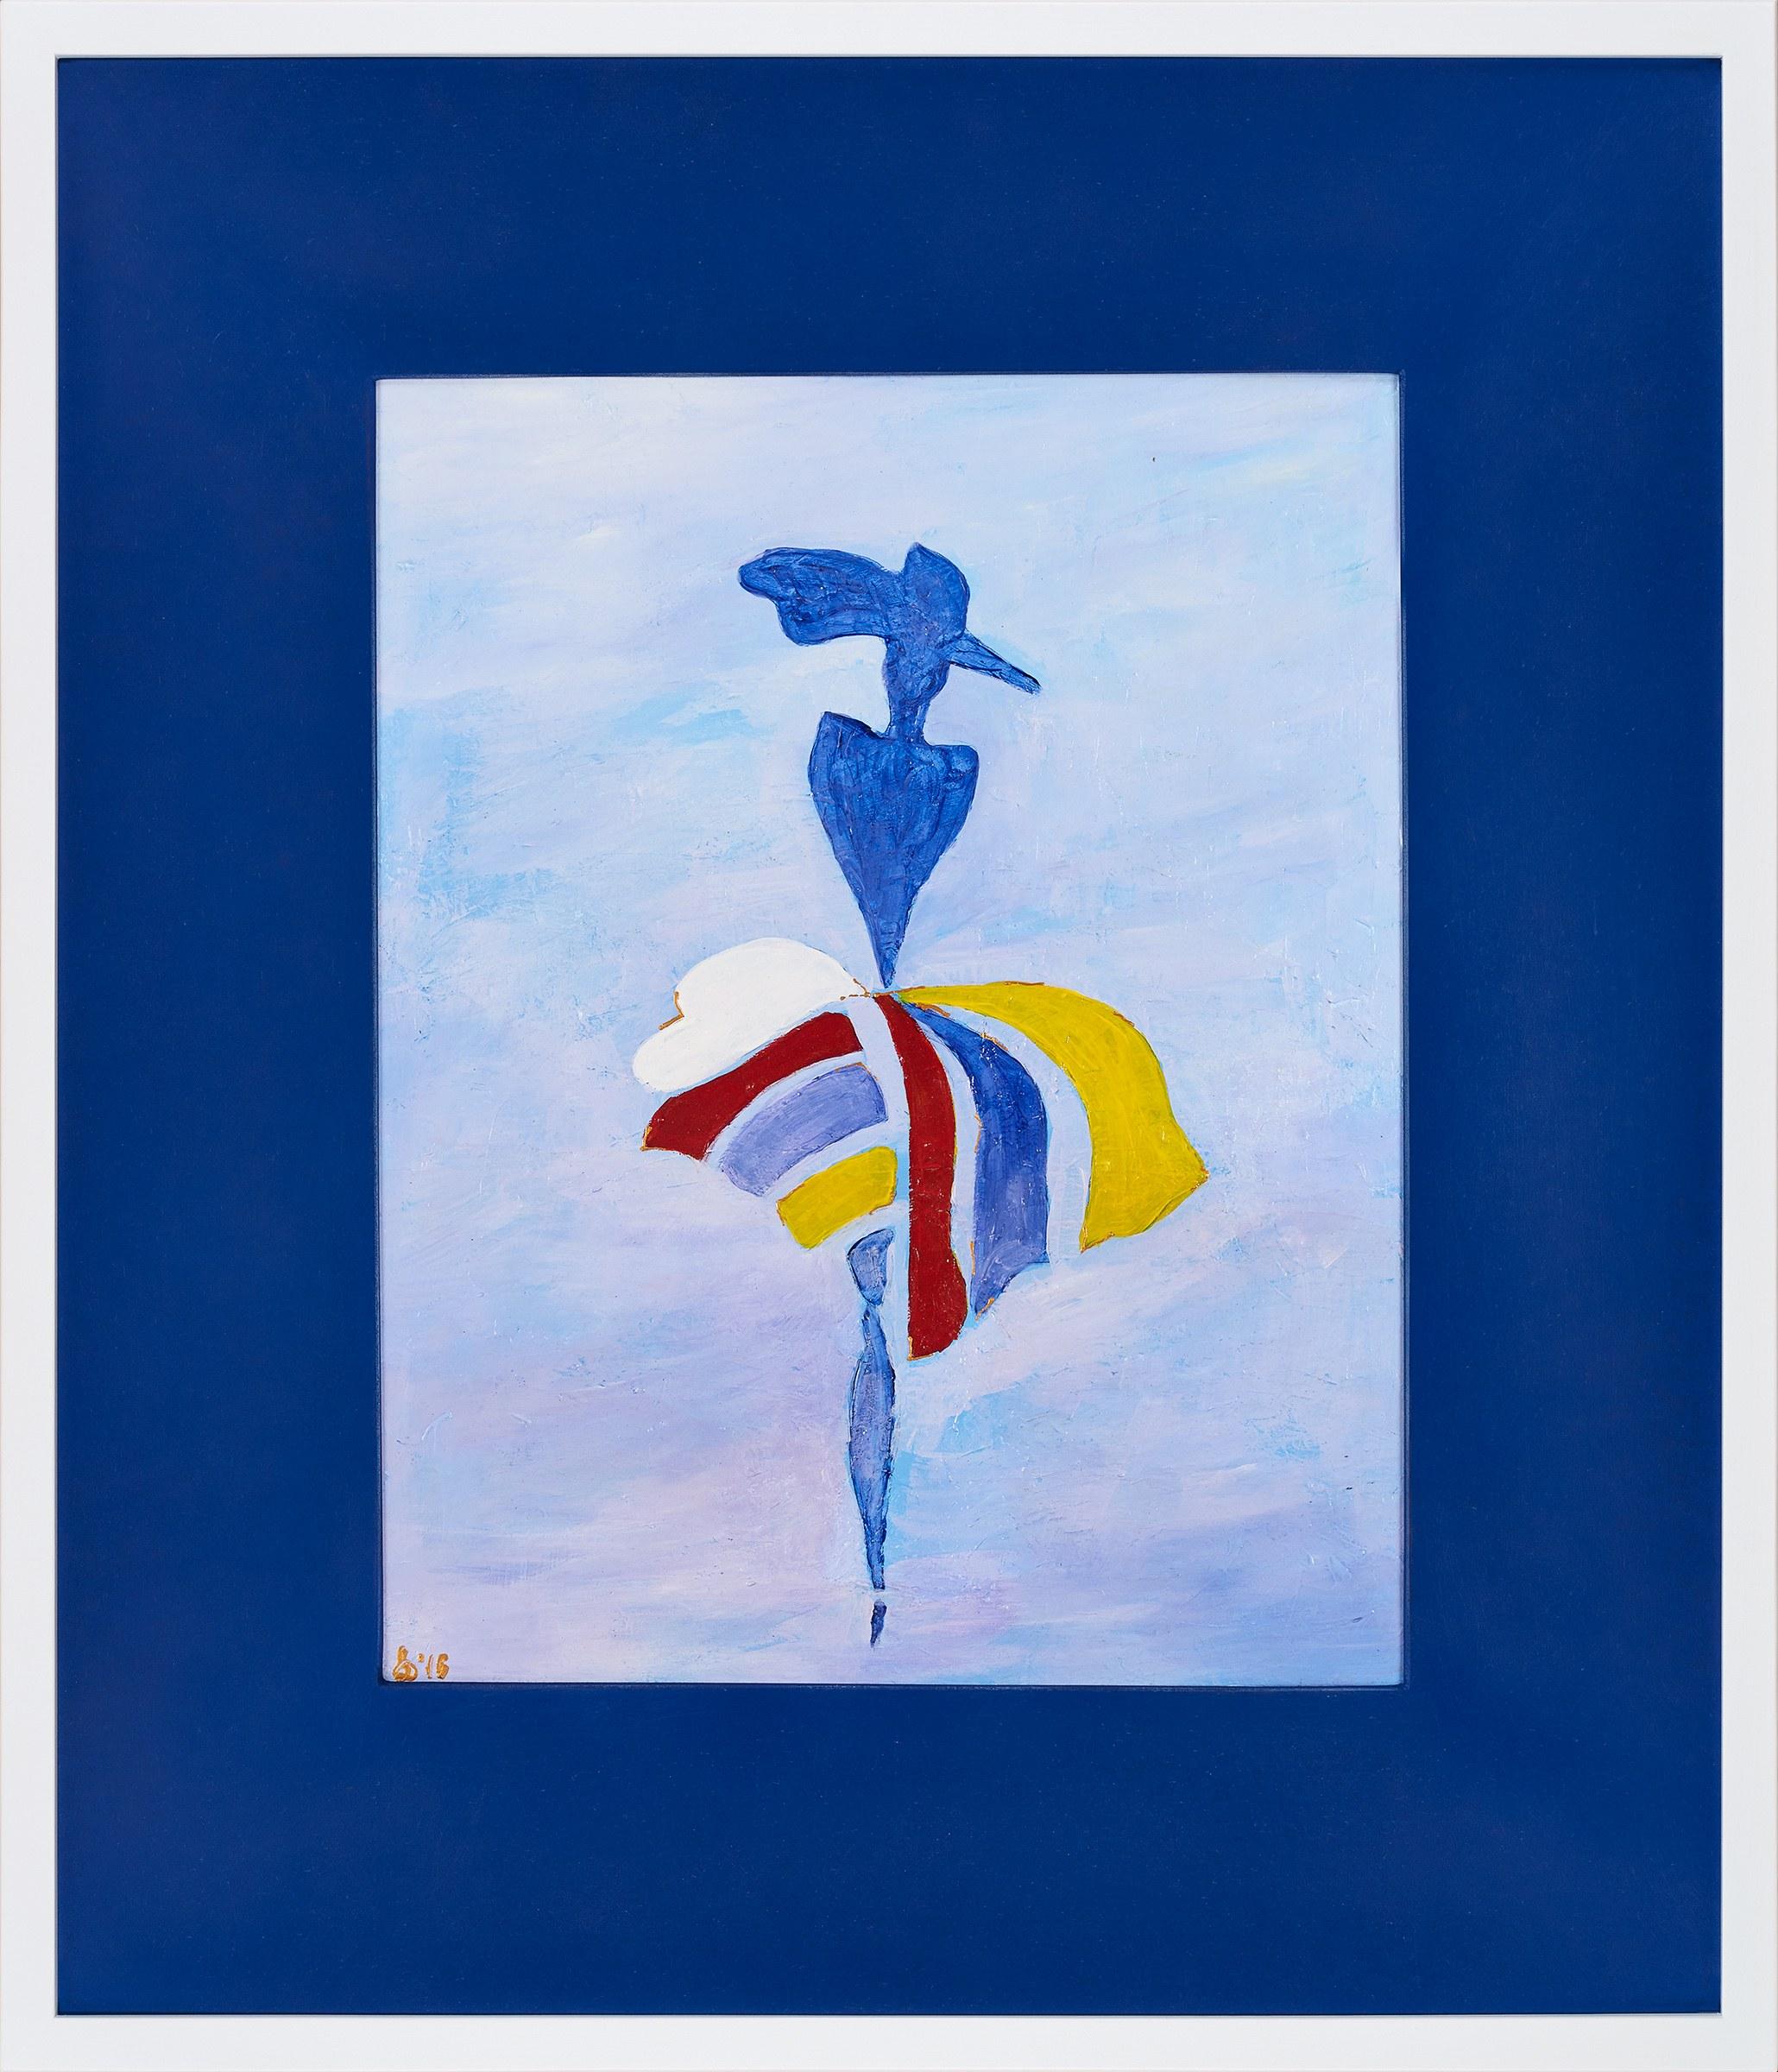 Lidia Dragon (1972), Forma, 2016